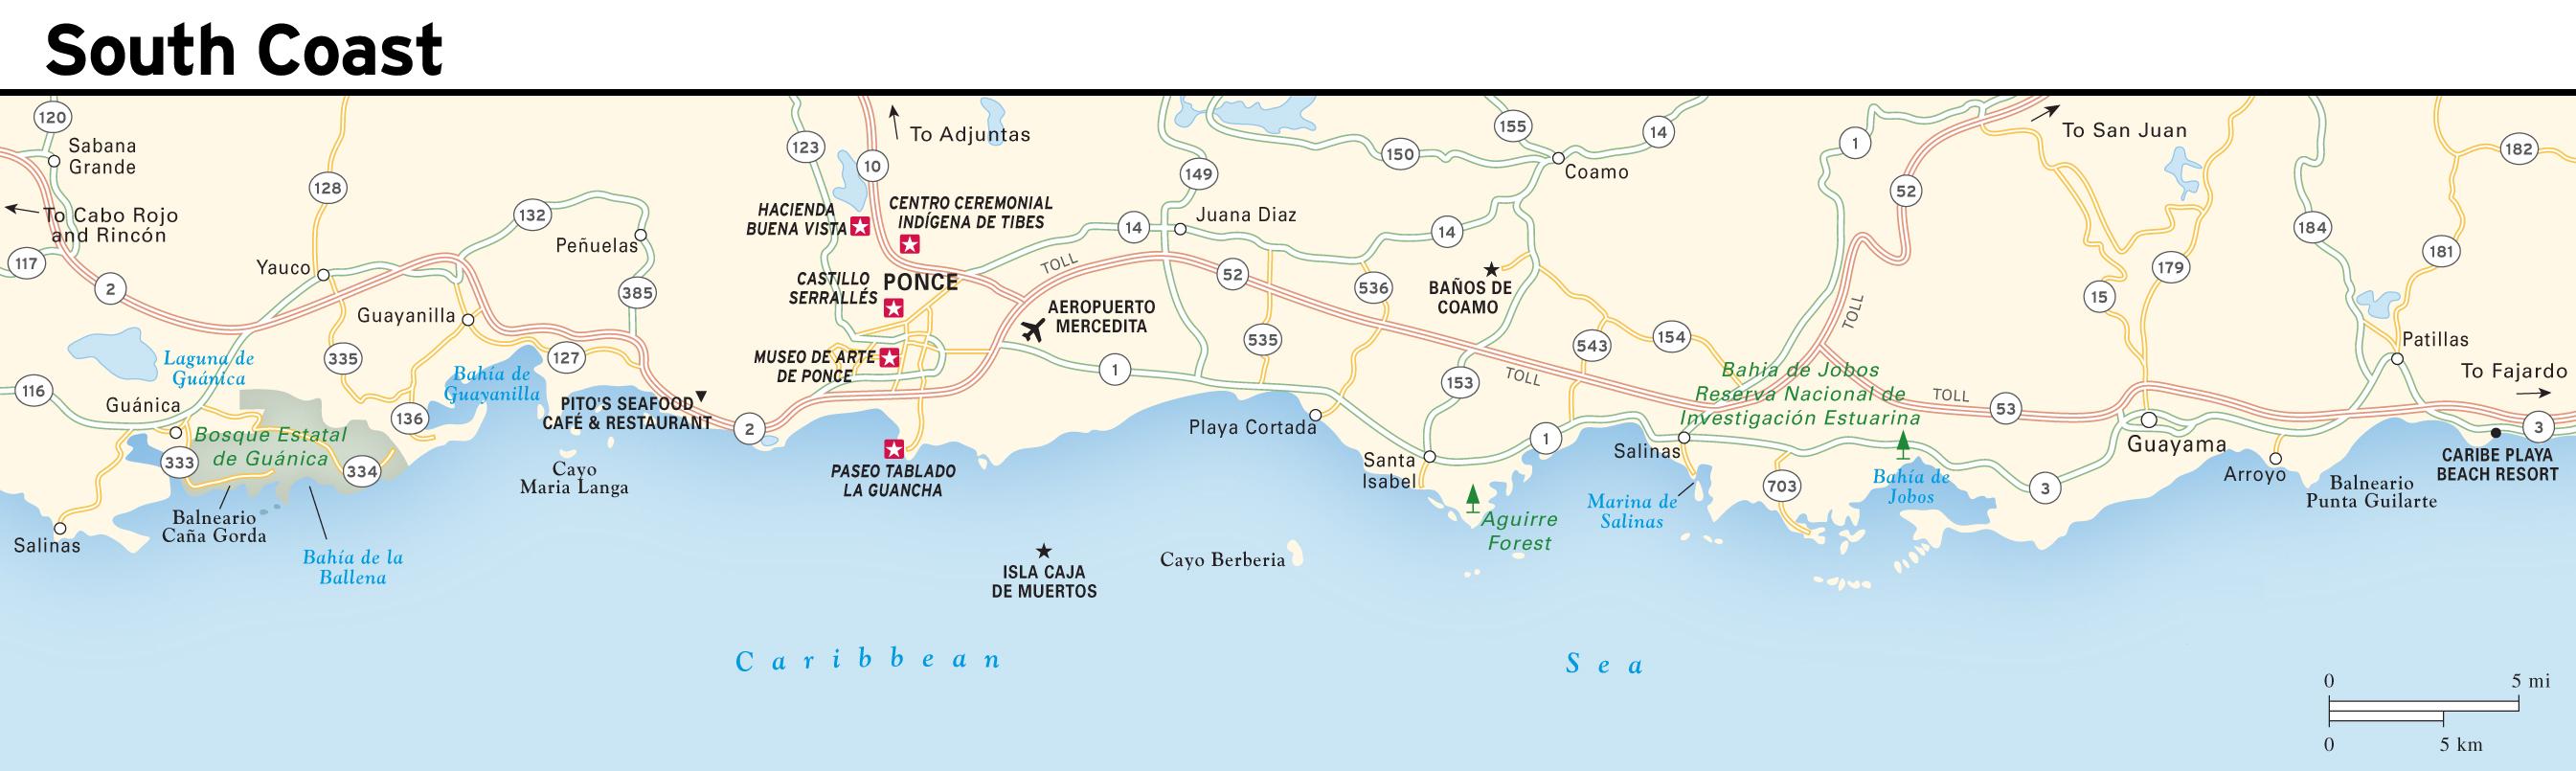 South Coast Map Large detailed South Coast map of Puerto Rico | Puerto Rico  South Coast Map